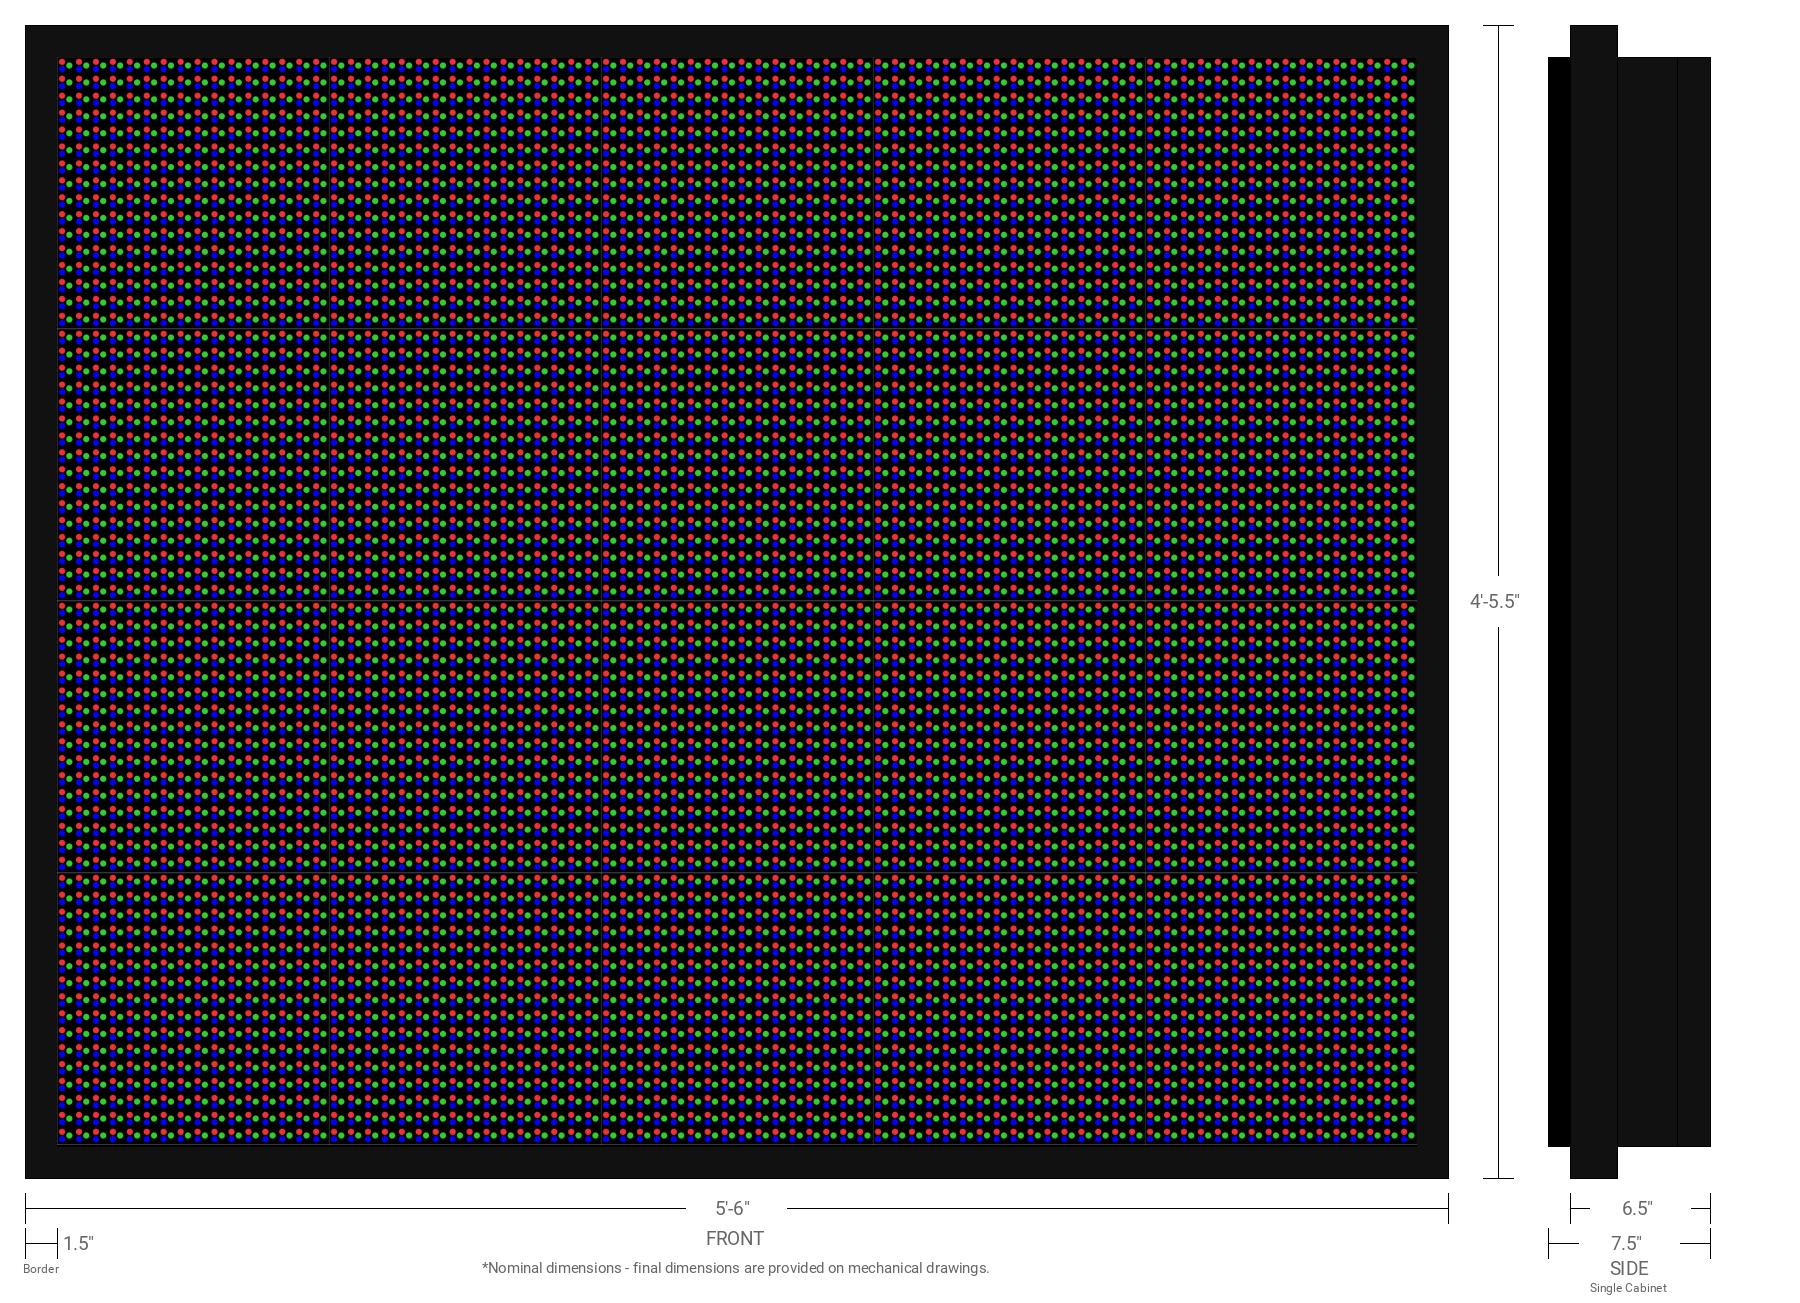 Aurora 20mm 64x80 Single Sided Full Color LED Display